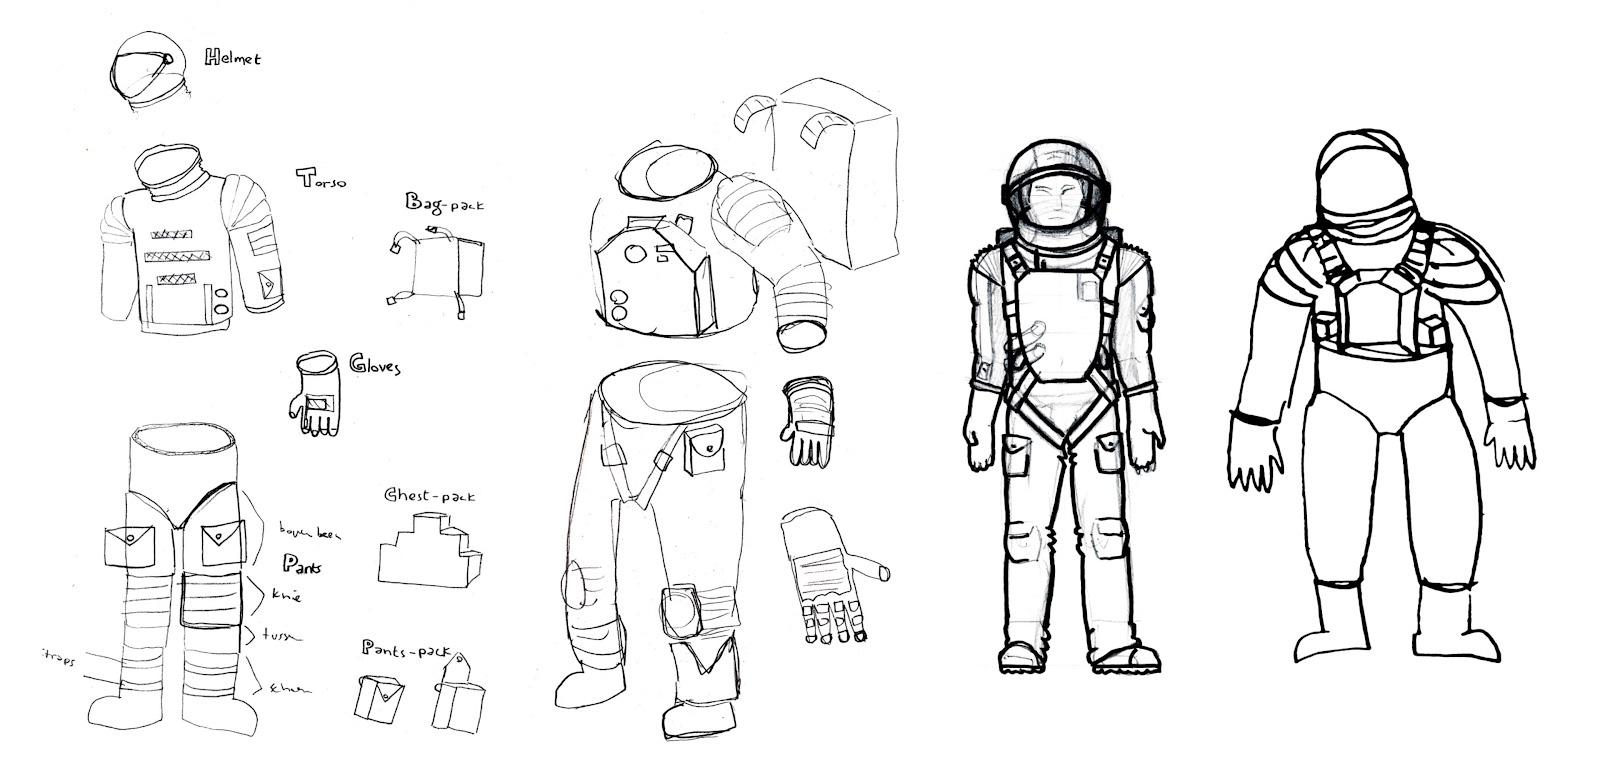 ceres-program-sketches.jpg